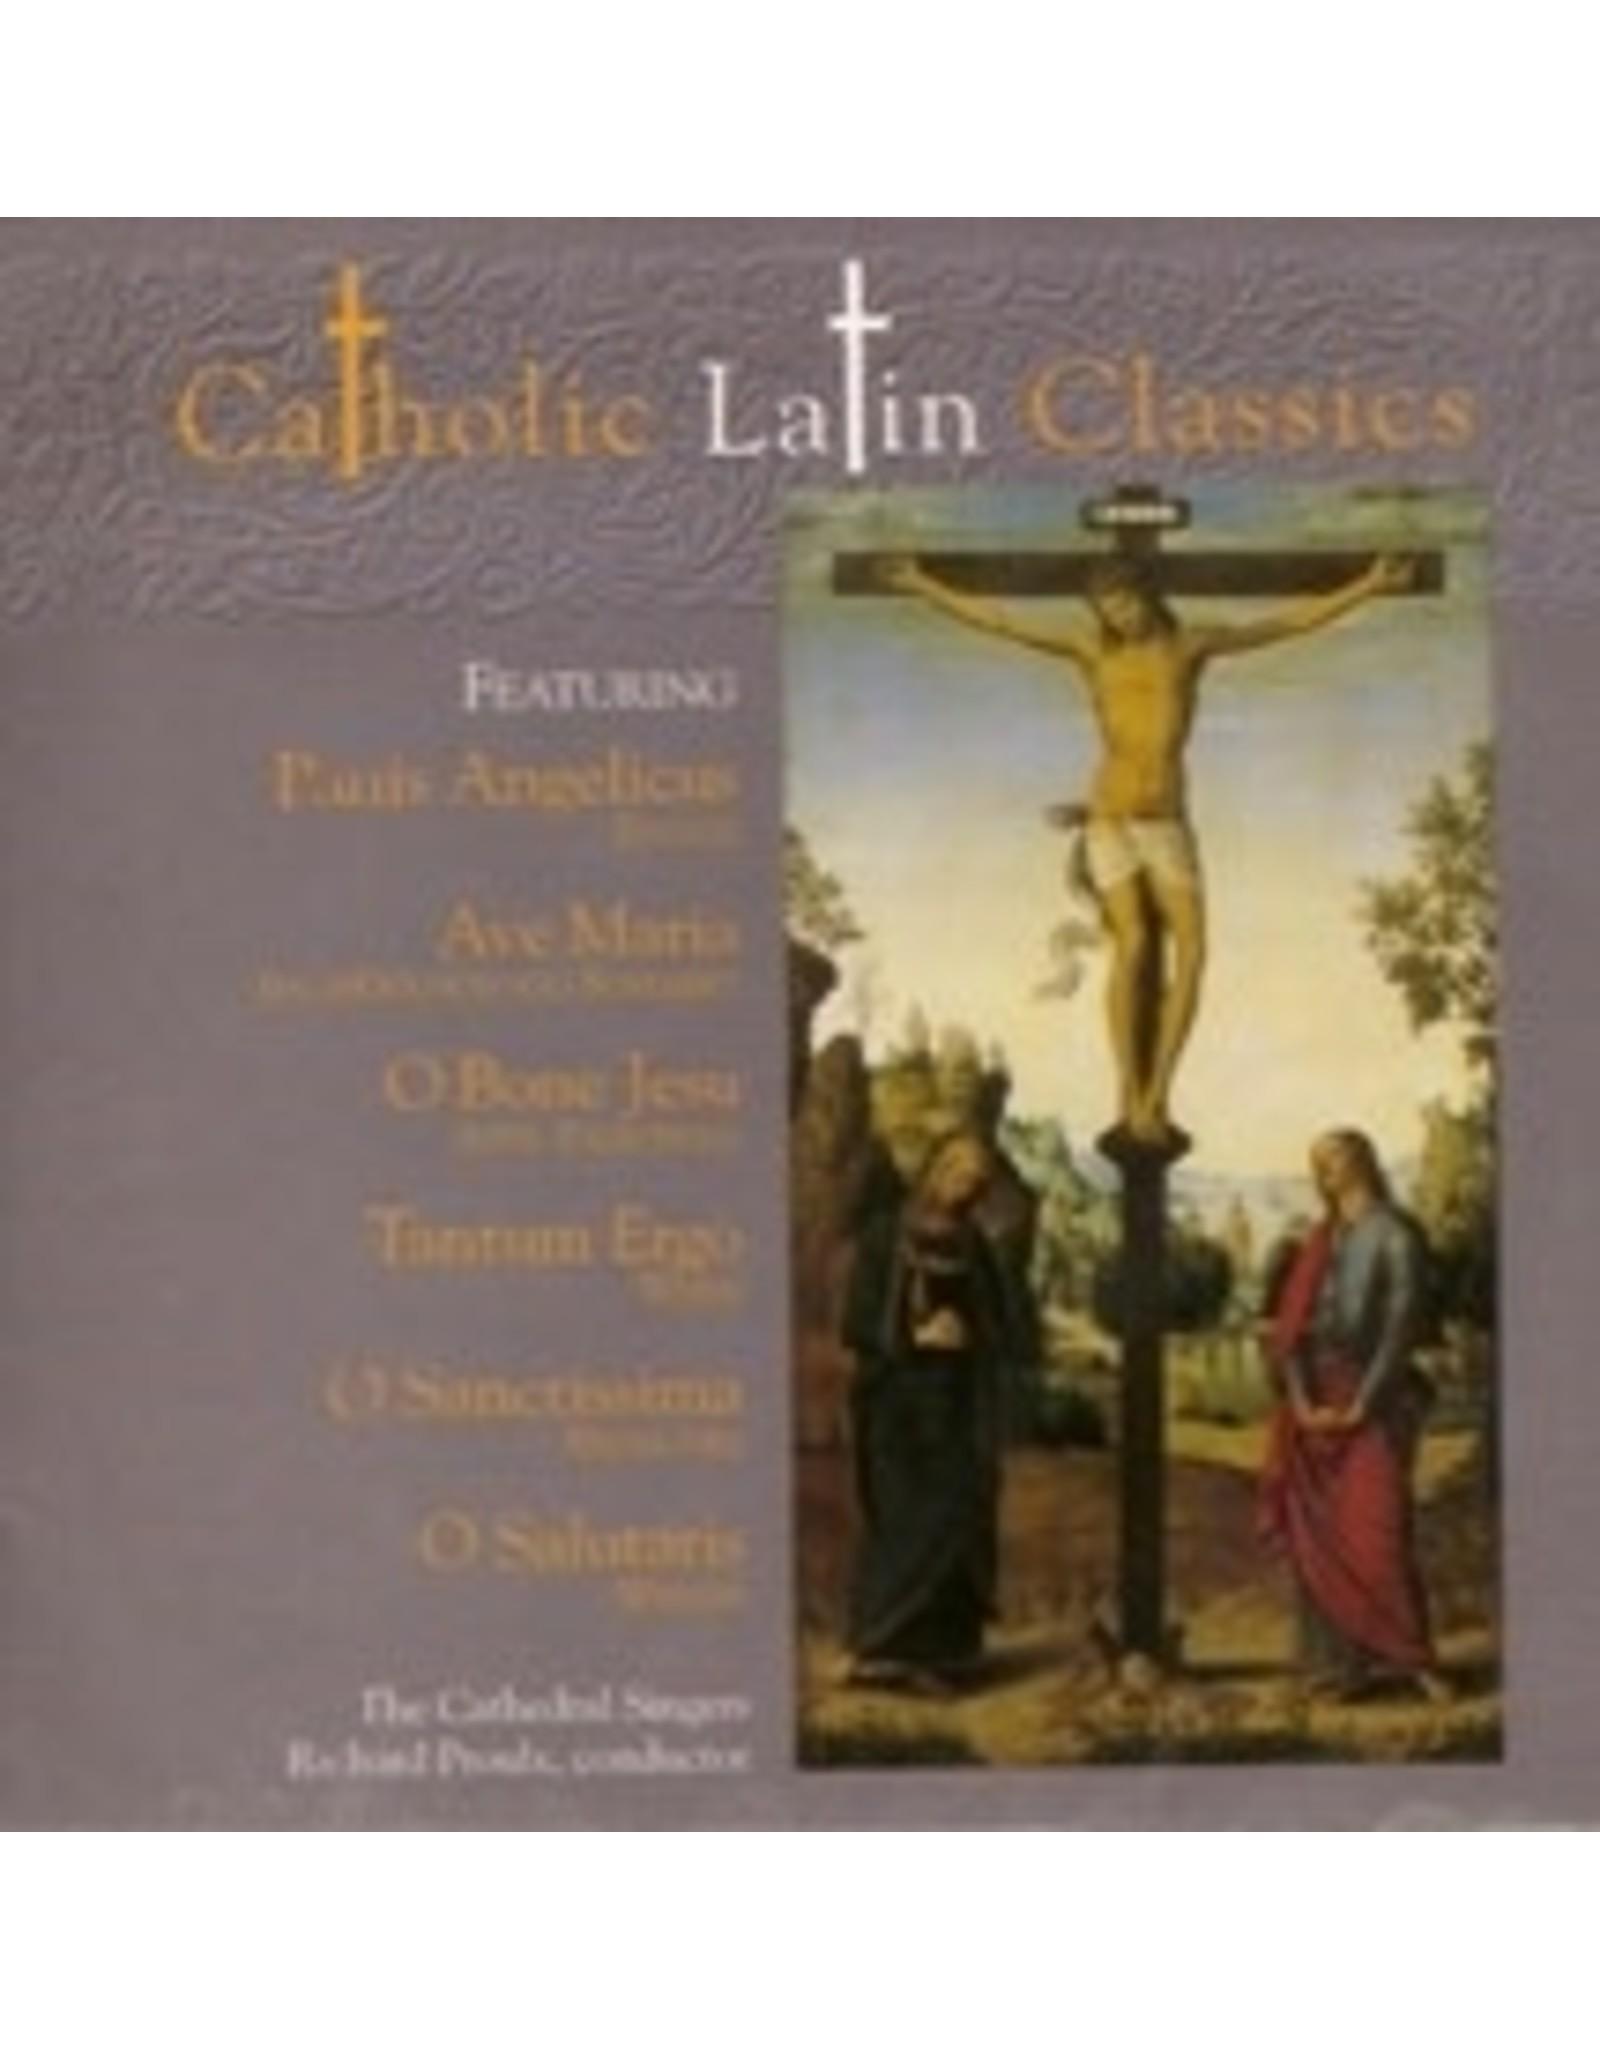 Catholic Latin Classics (CD)